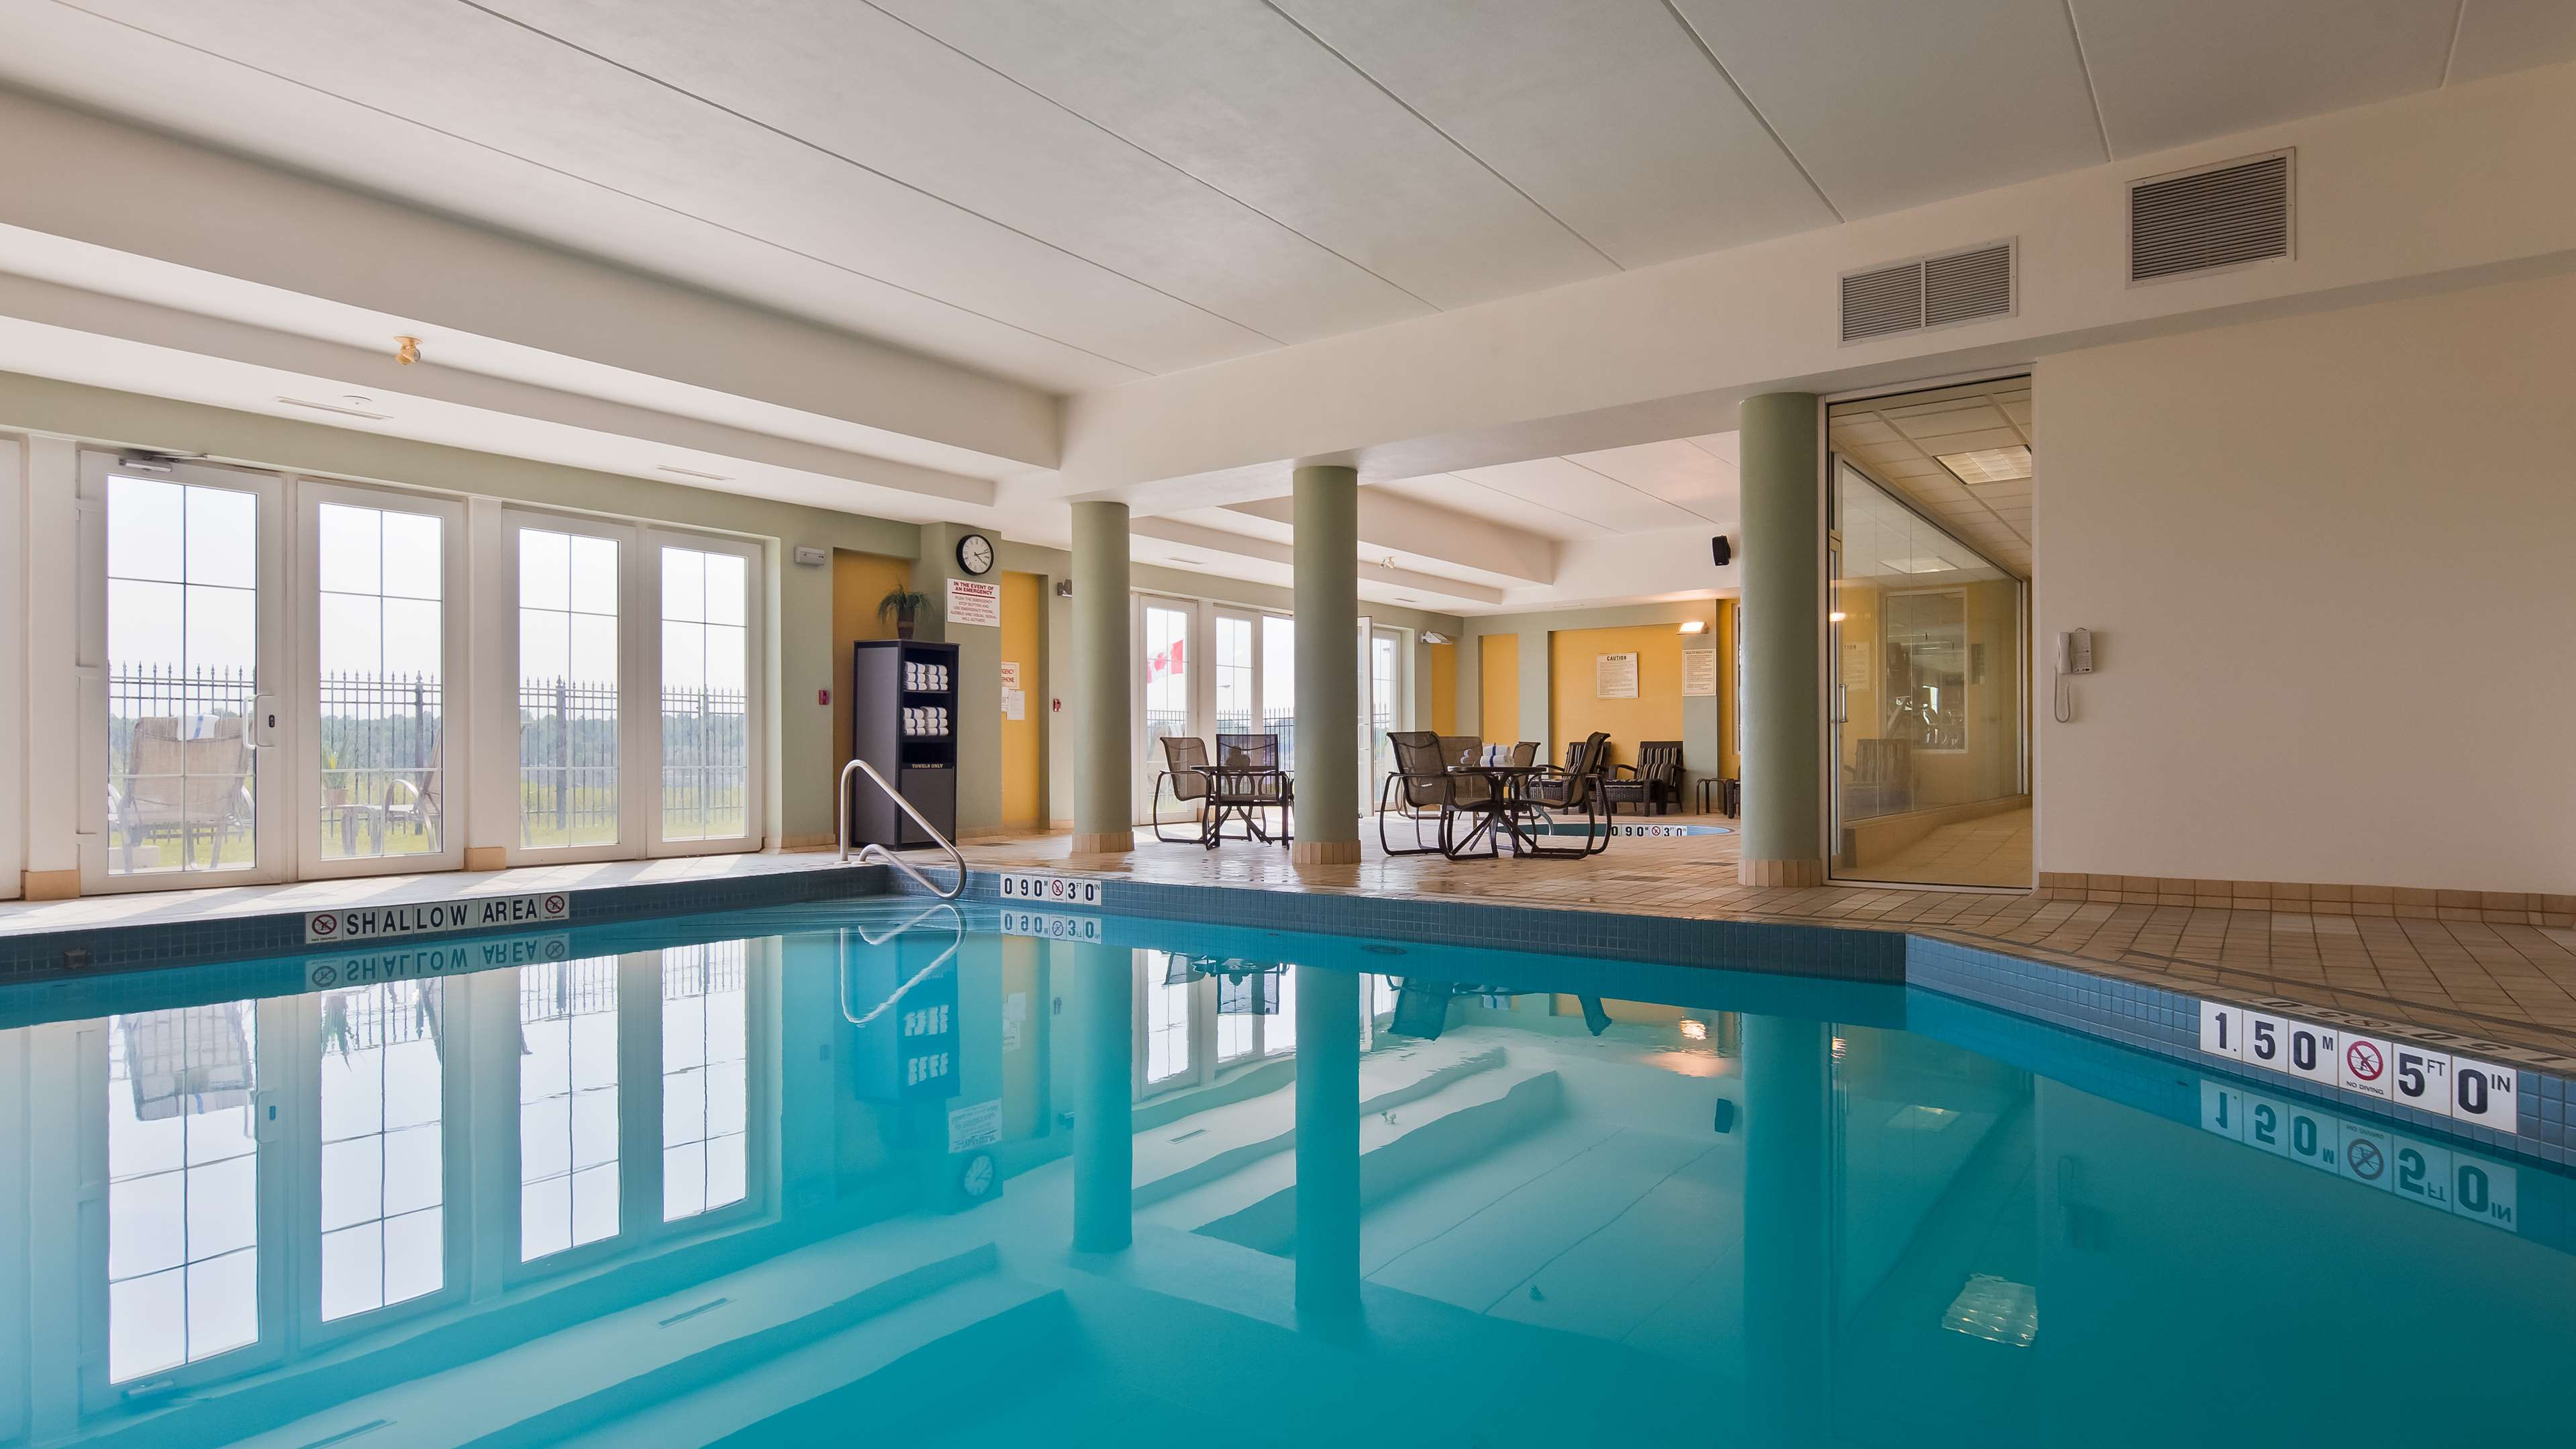 Indoor Pool Best Western Plus Orangeville Inn & Suites Orangeville (519)941-3311